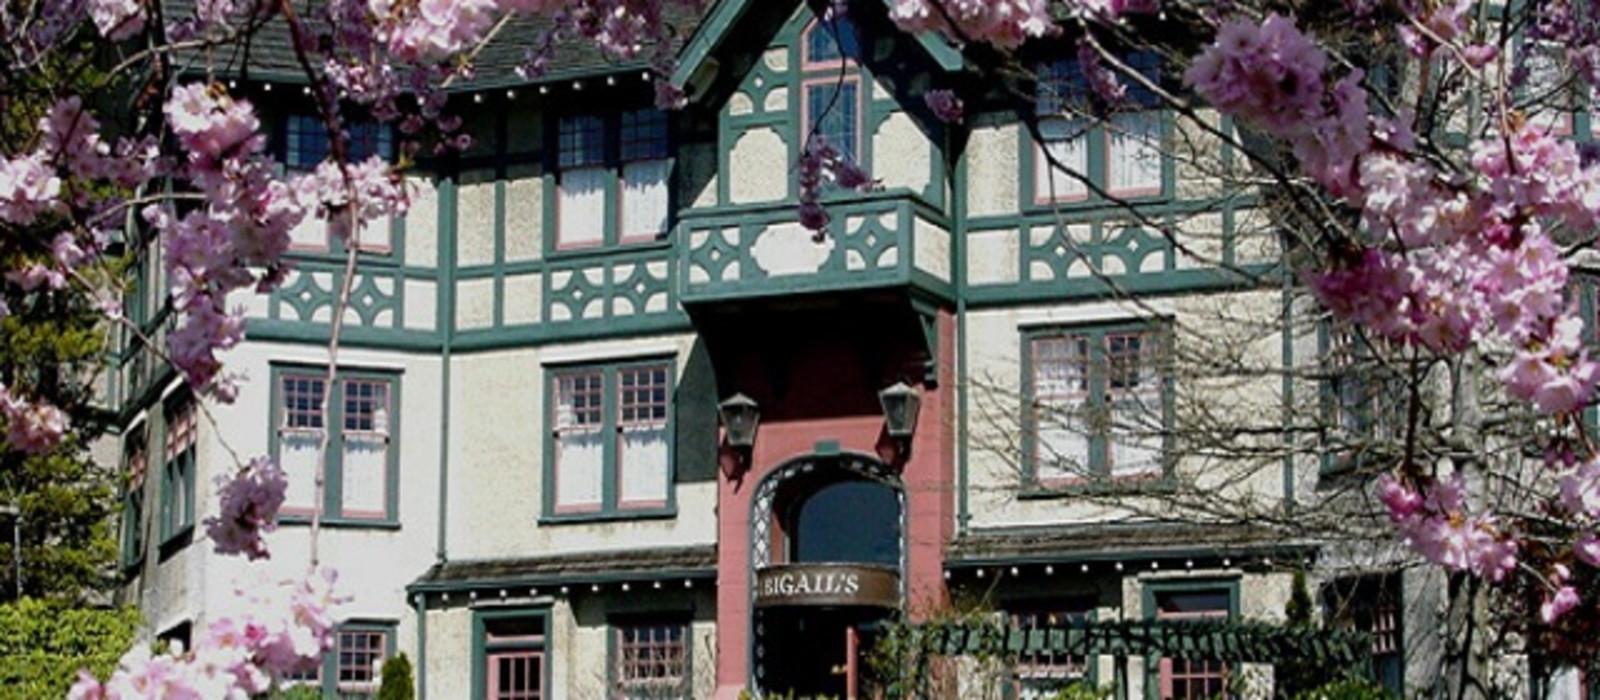 Hotel Abigail's  Kanada